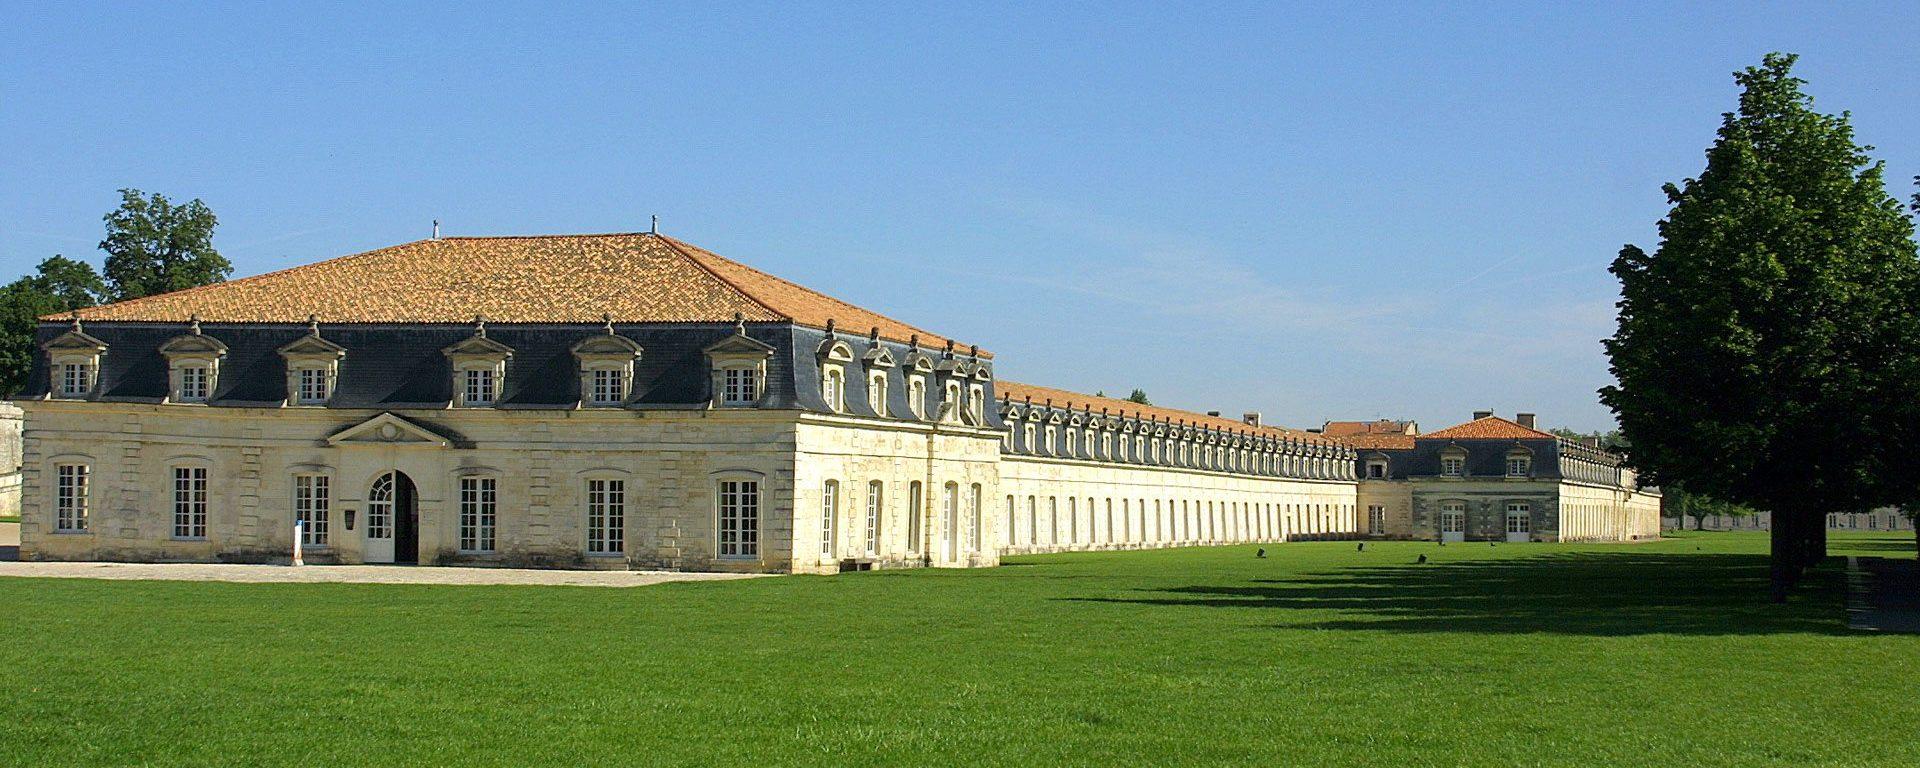 rochefort-corderie-royale-s-rouissillon-aspect-ratio-2000-800